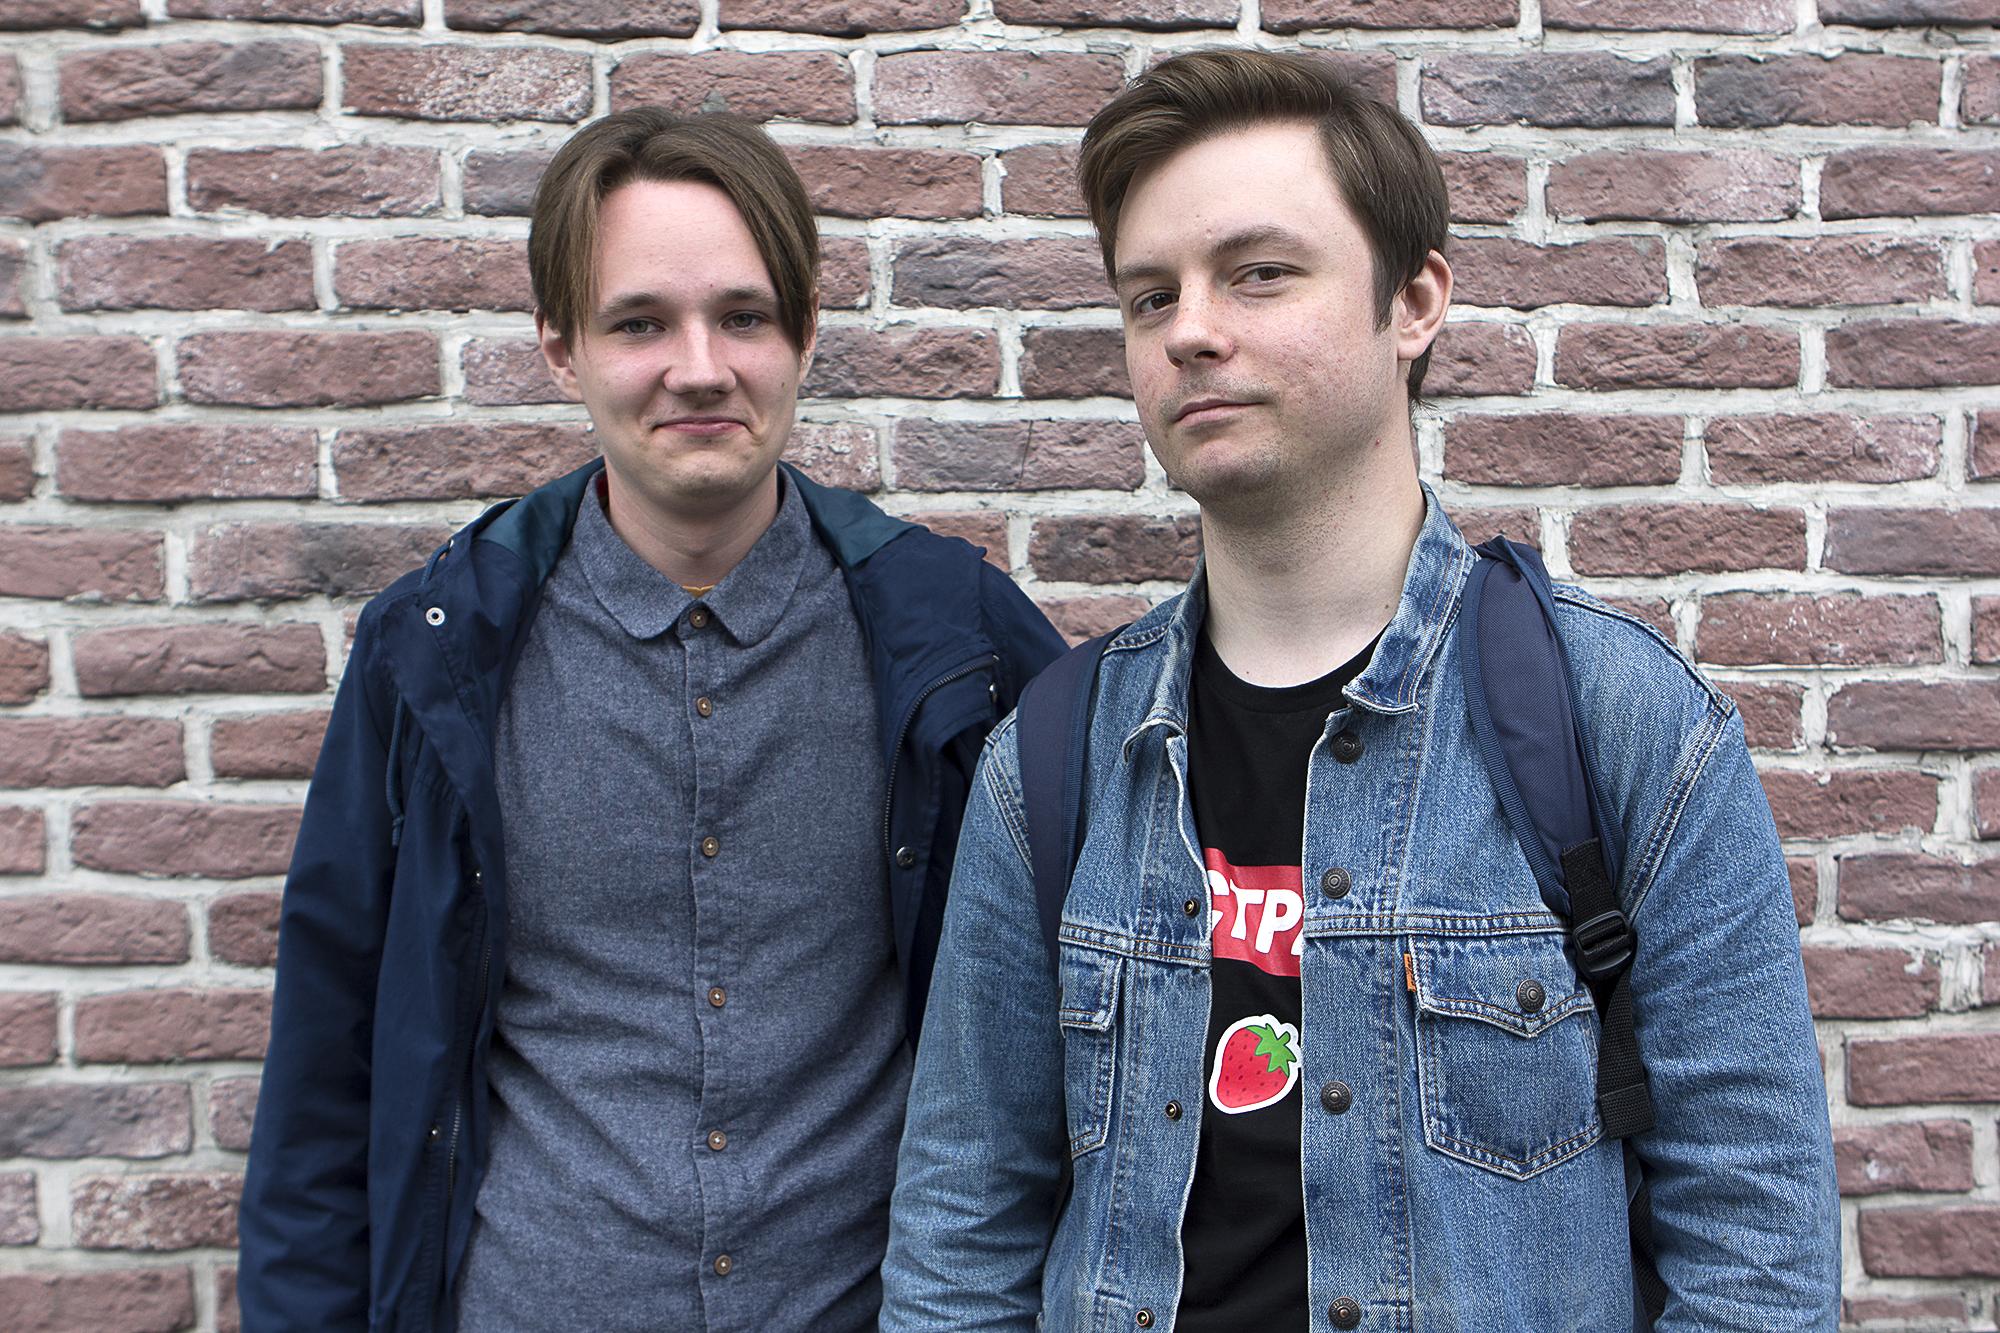 Members of Democratic Movement Vesna - Bogdan & Fryderyk -for  Huffington Post Germany